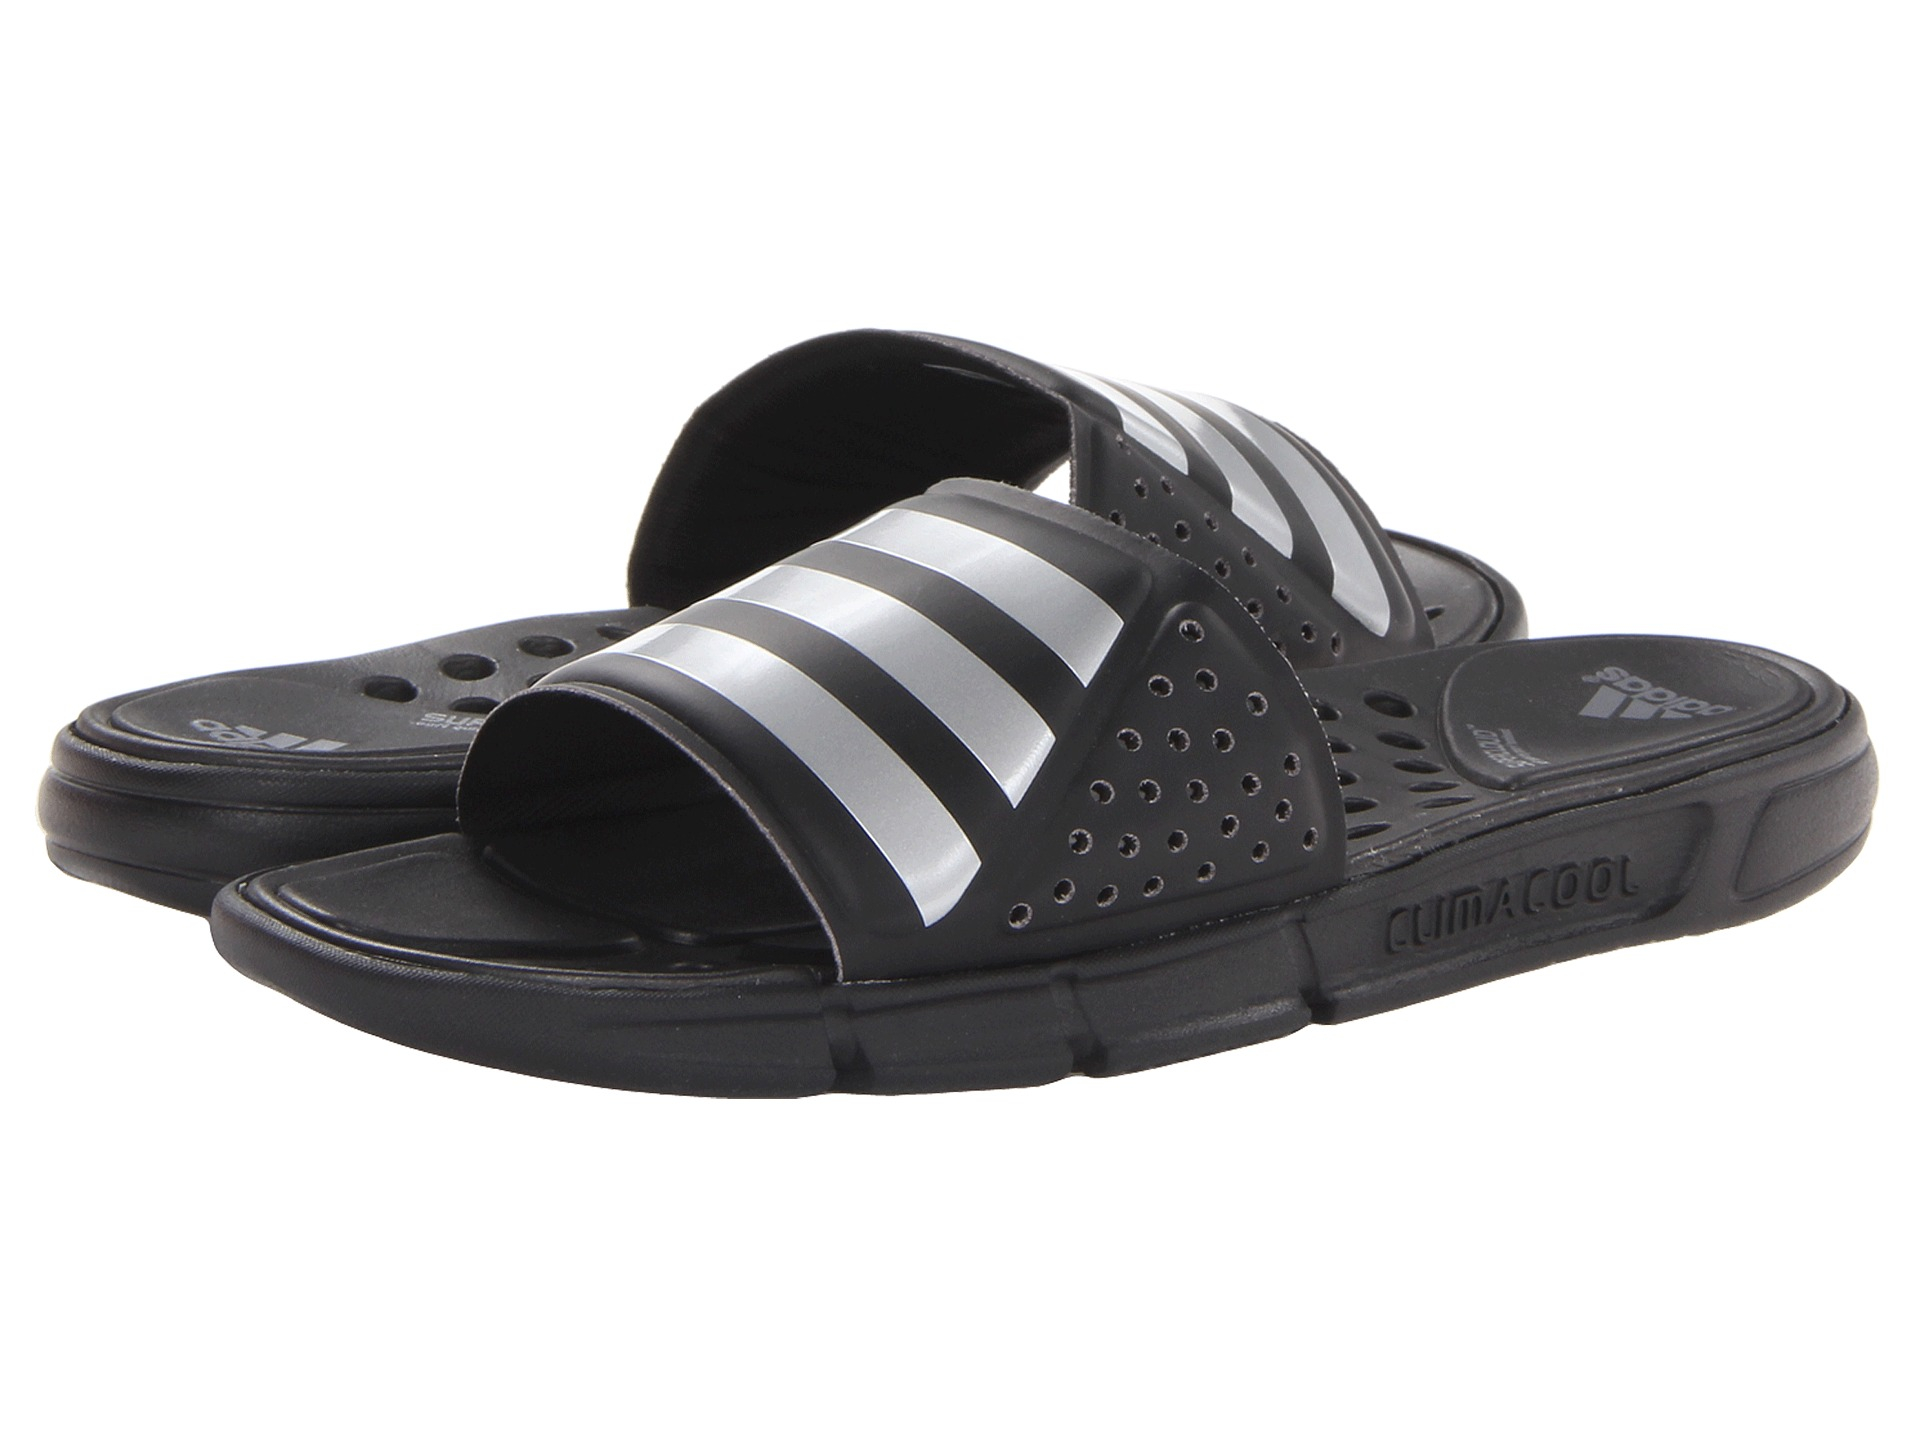 ba1df473c65 Lyst - adidas Climacool® Revo 3 Slide in Black for Men